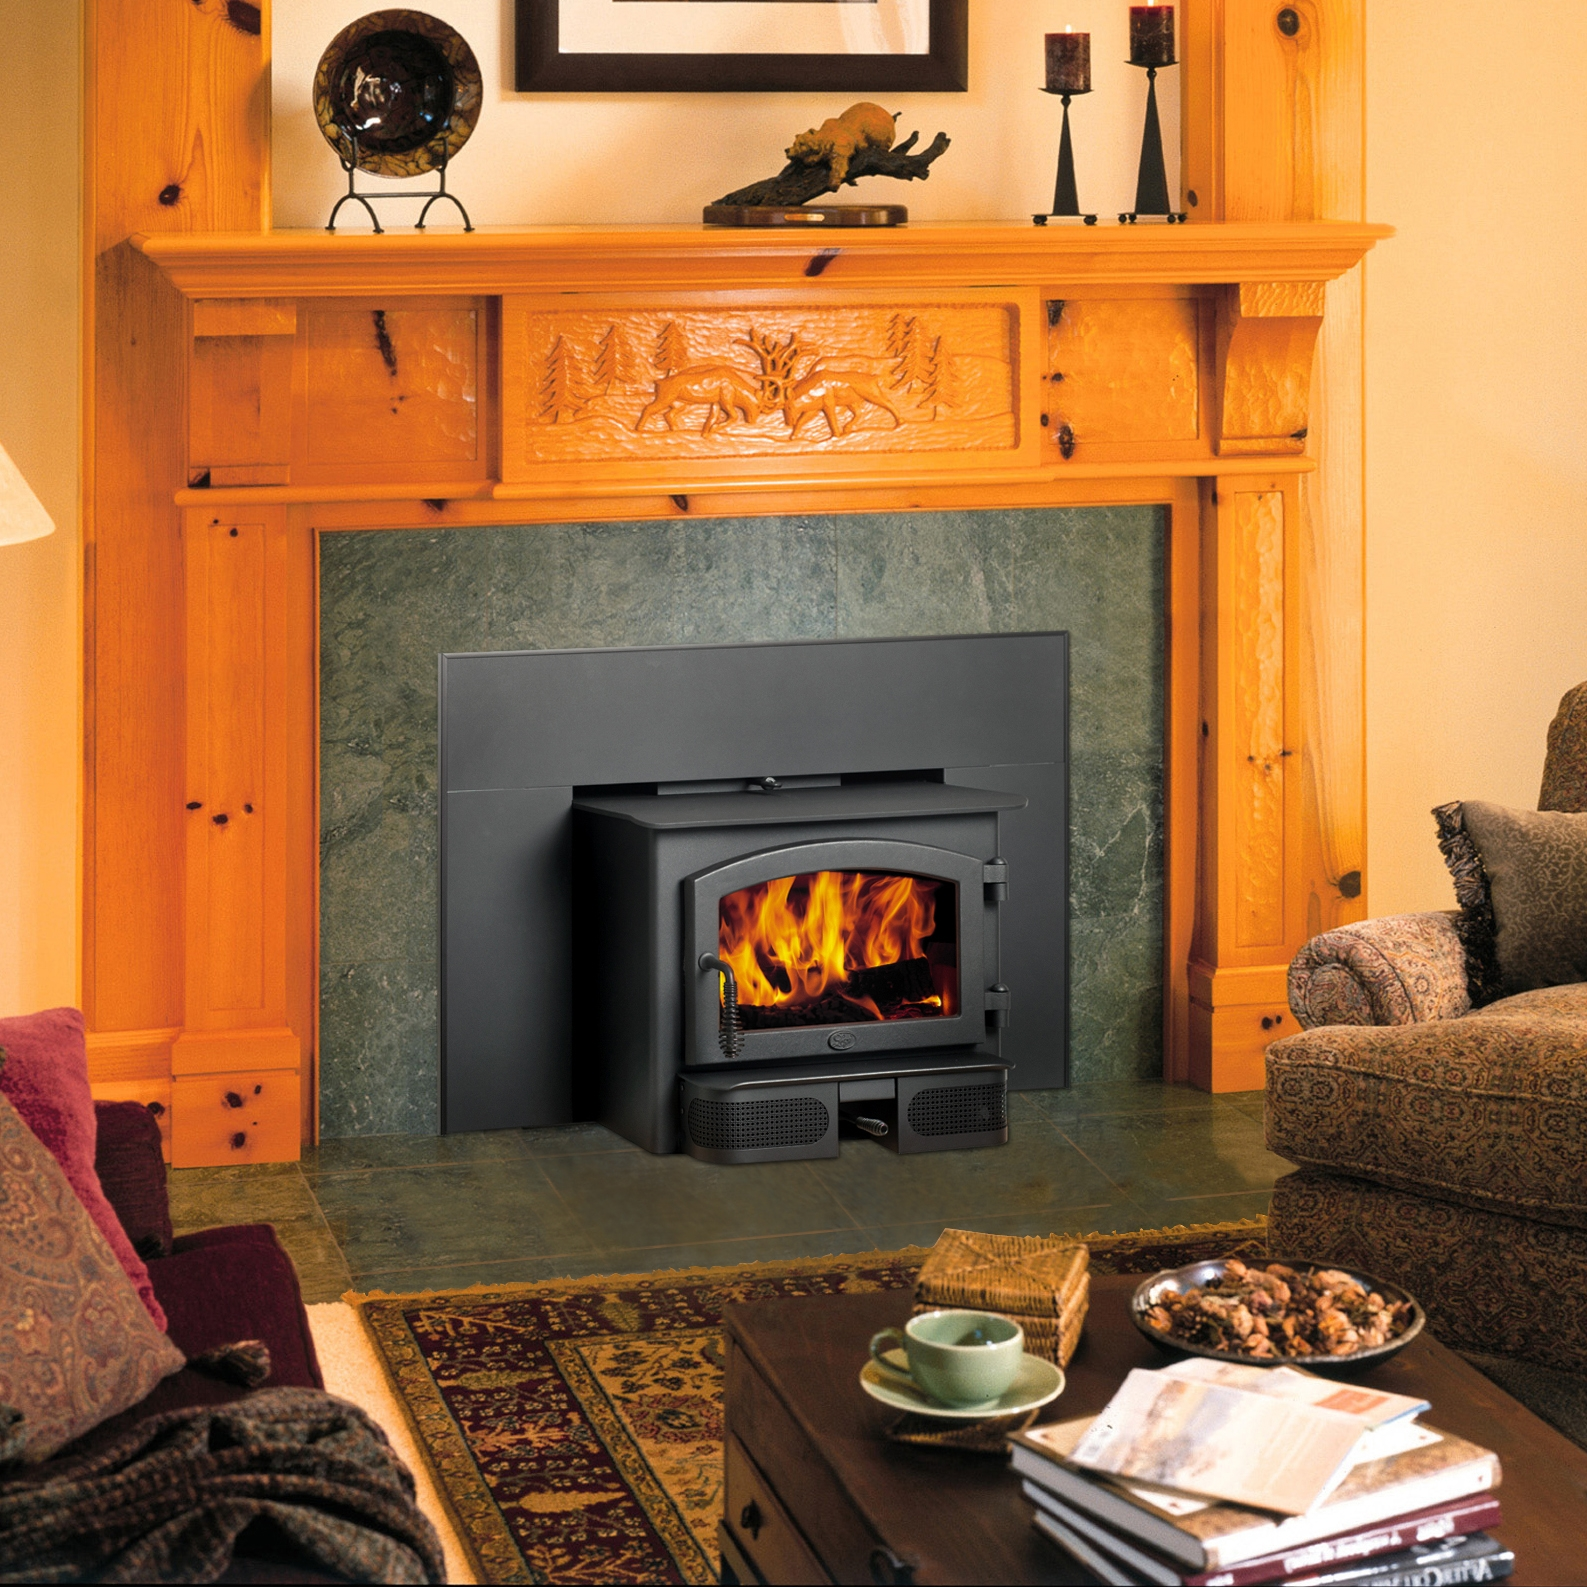 Home Fire Stove, Salem Oregon | Republic 1750 Wood Stove Insert.jpg. - Home Fire Stove, Salem Oregon Republic 1750 Wood Stove Insert.jpg